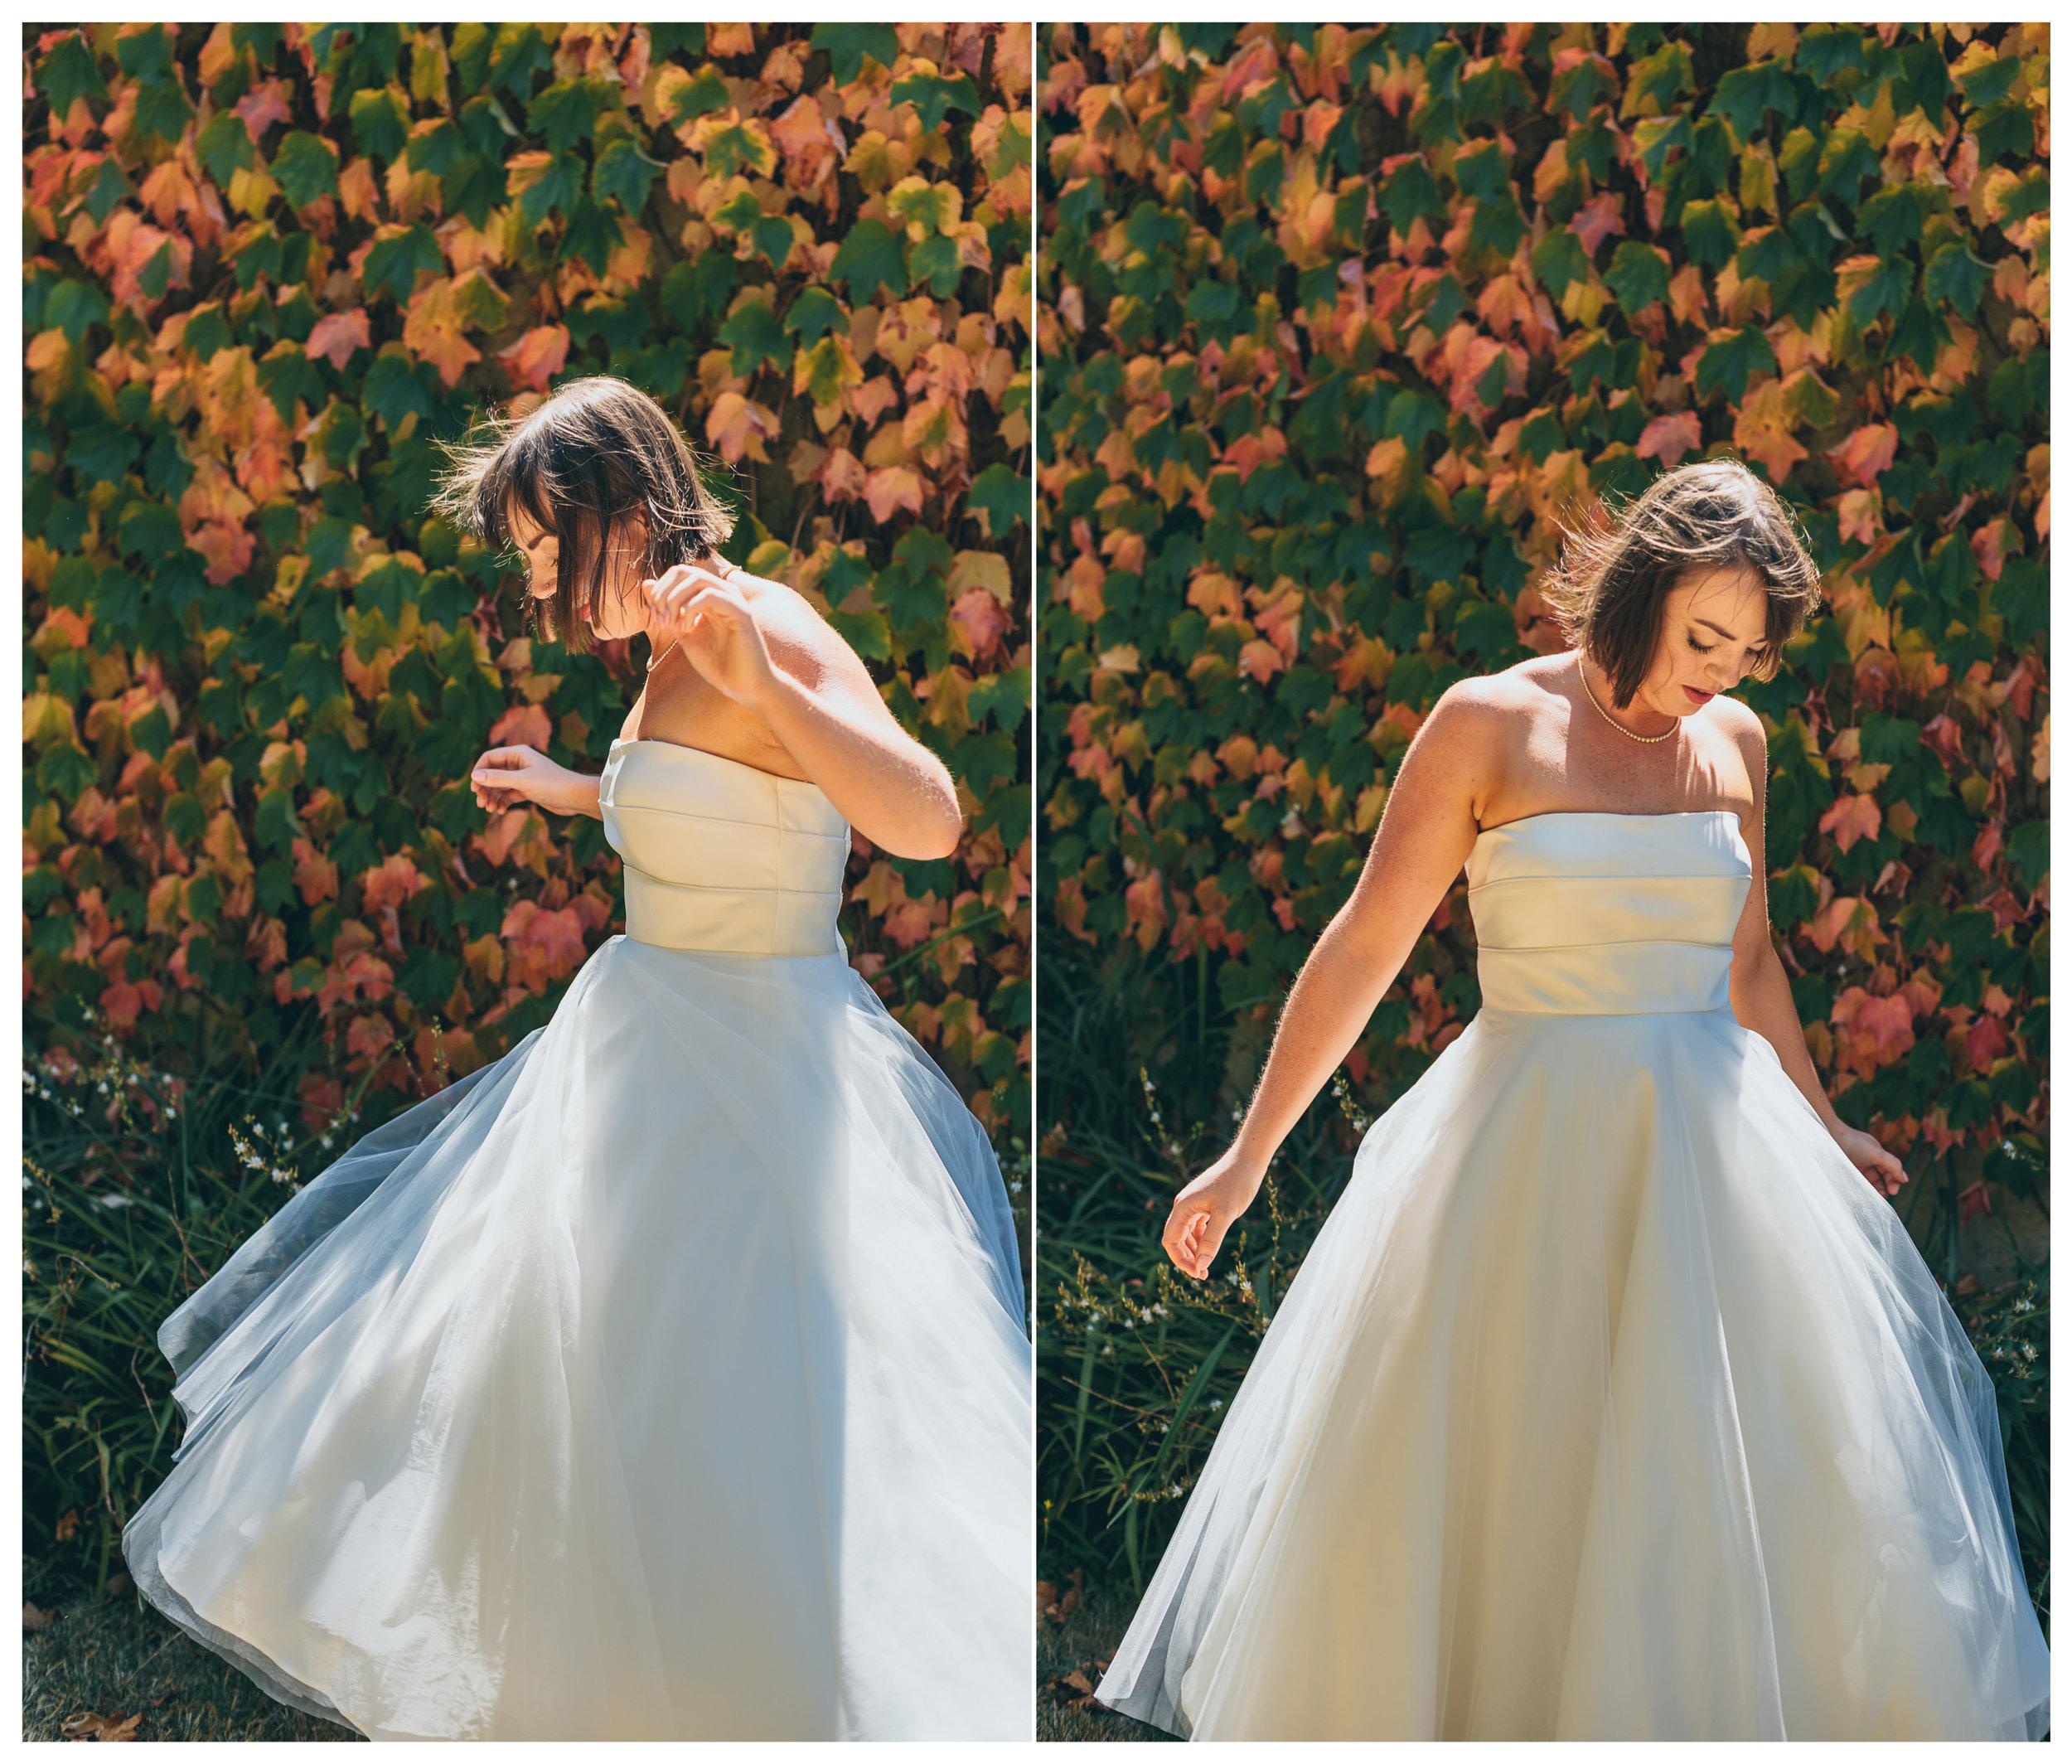 Dancing Kate.jpg